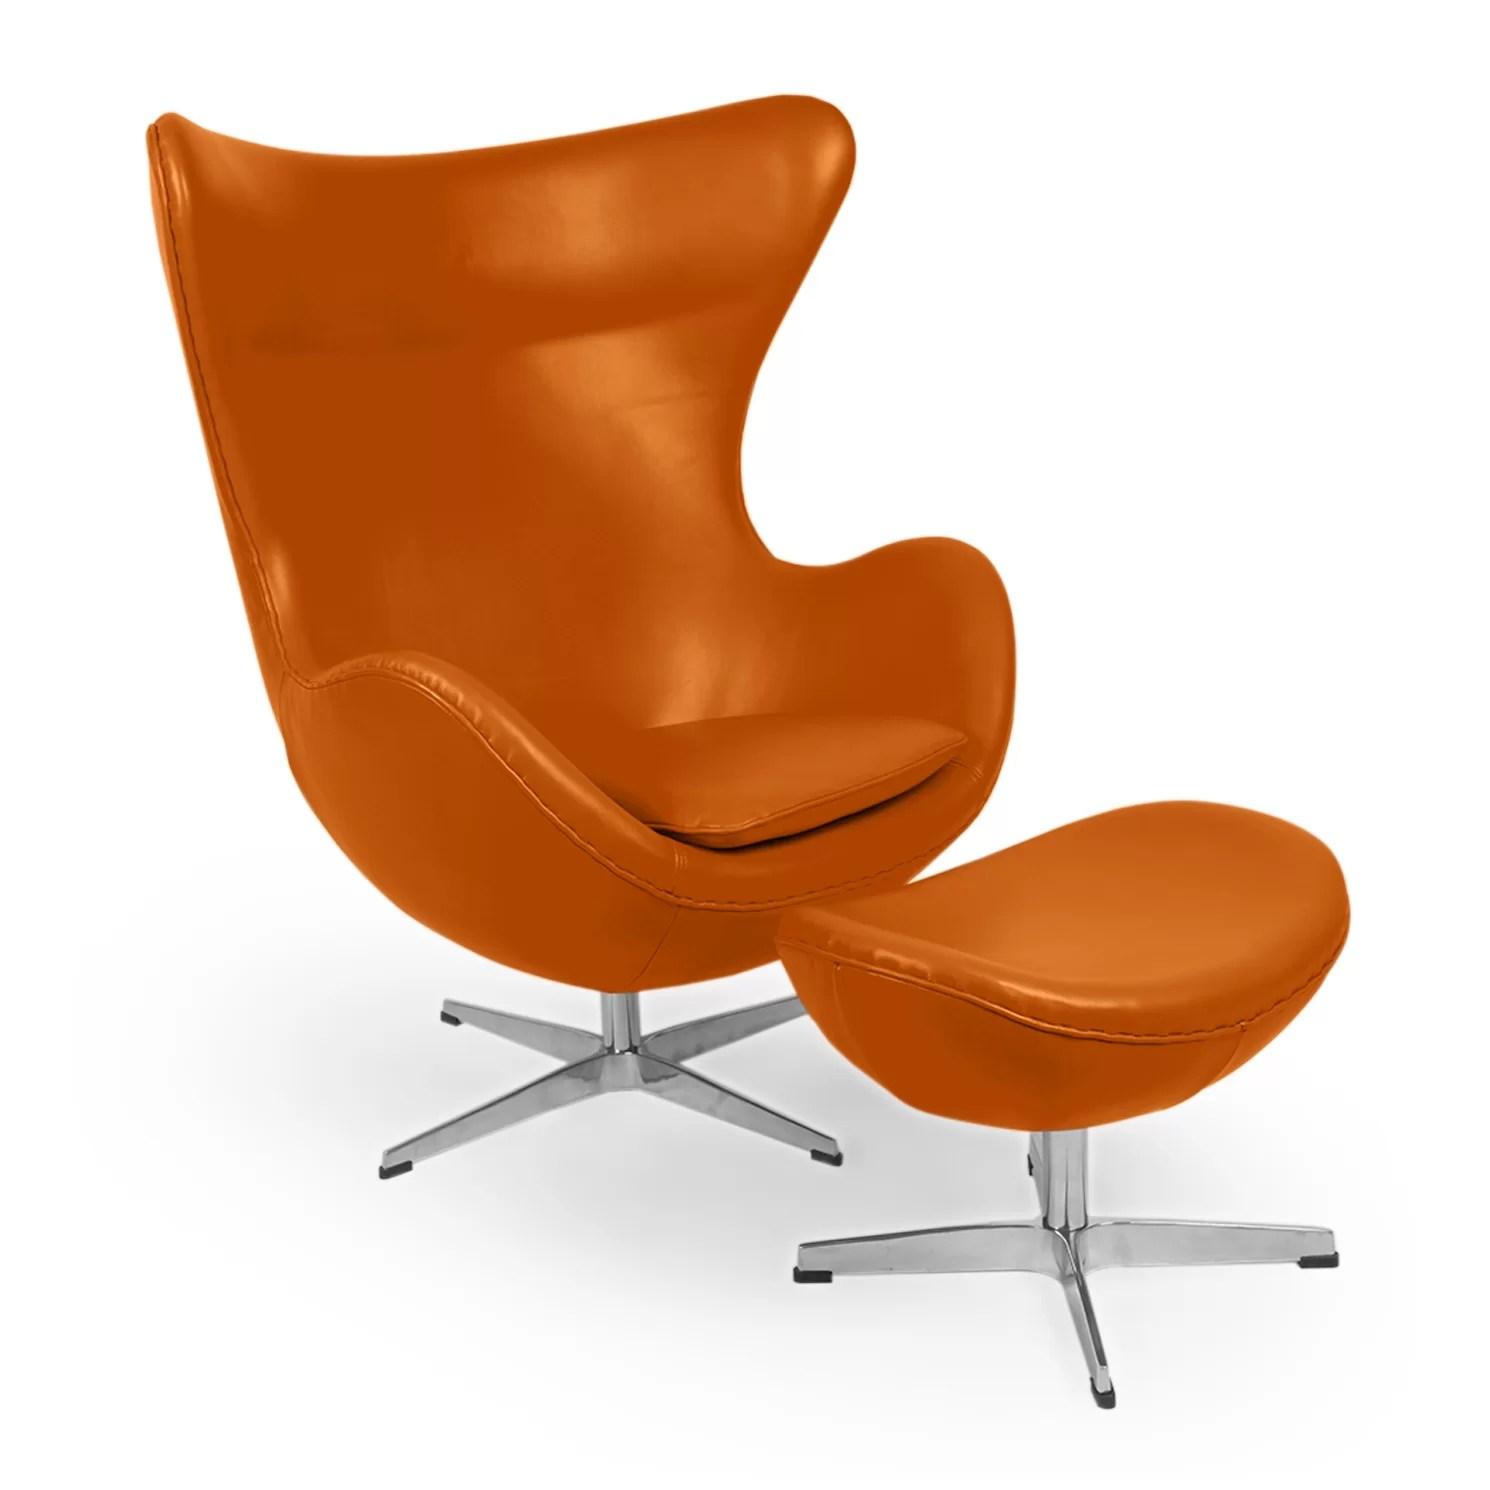 chair with balloons posture deluxe wooden kneeler amoeba balloon and ottoman allmodern